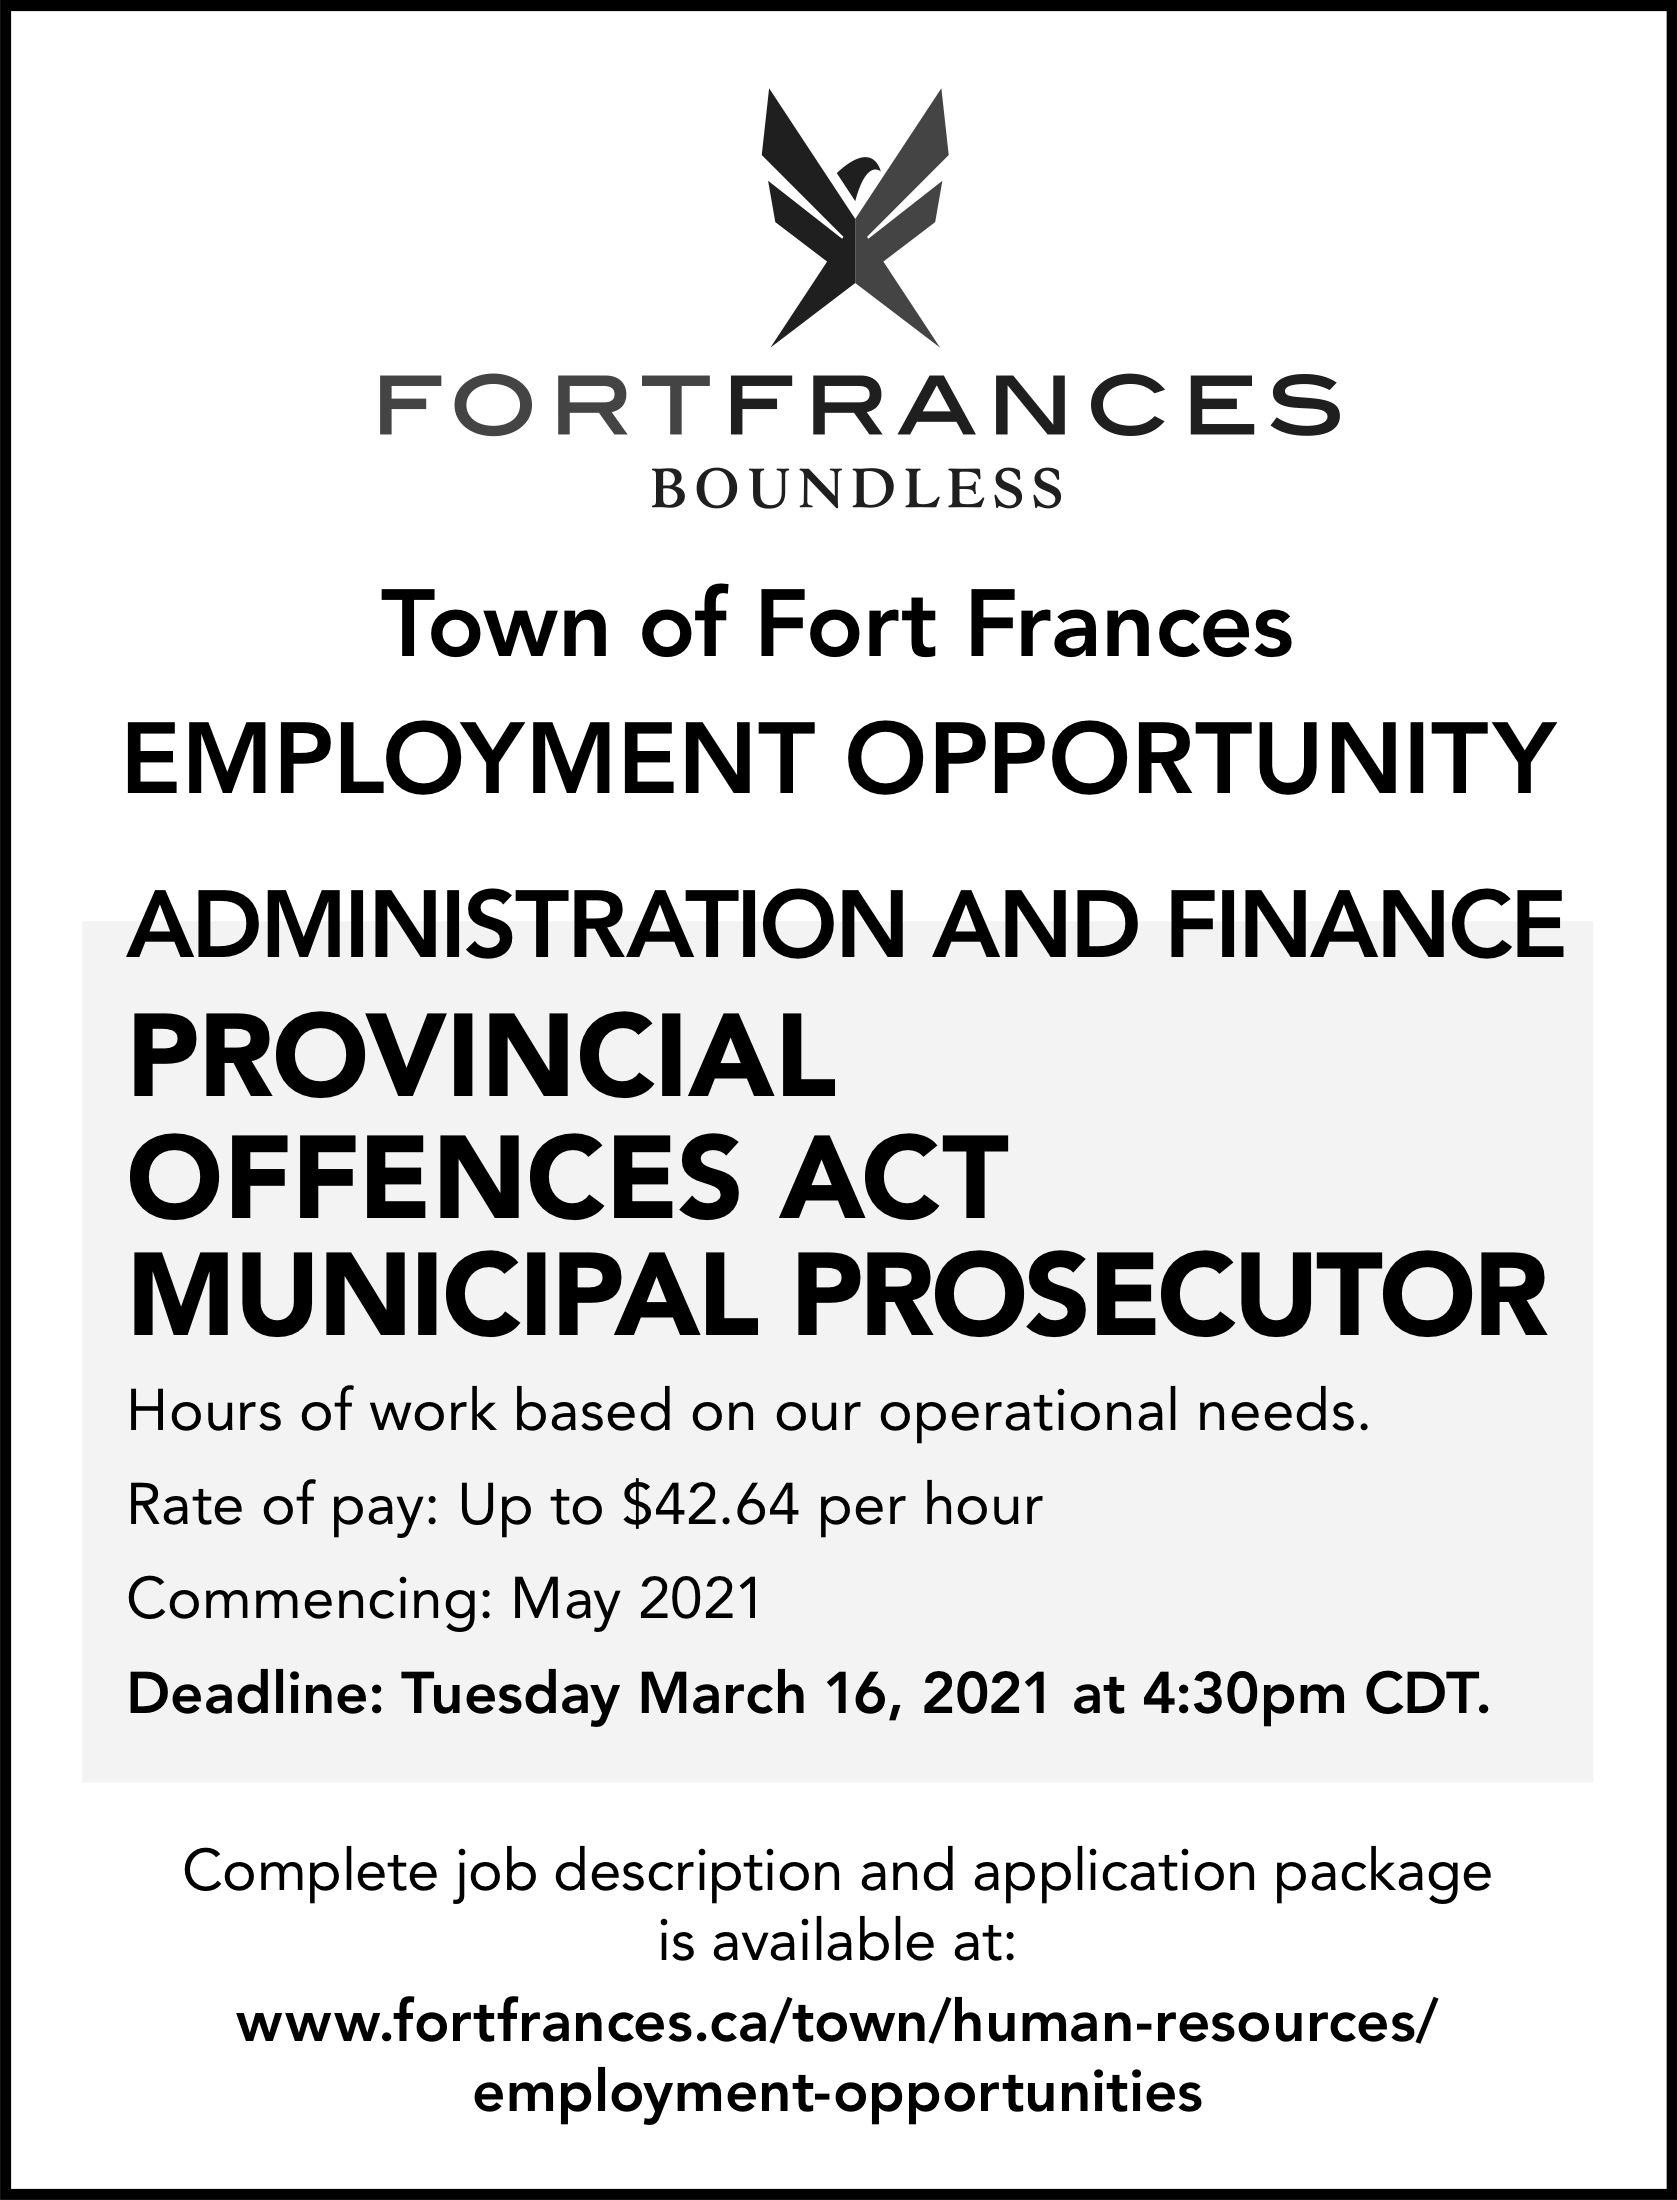 Provincial Offences Act Municipal Prosecutor